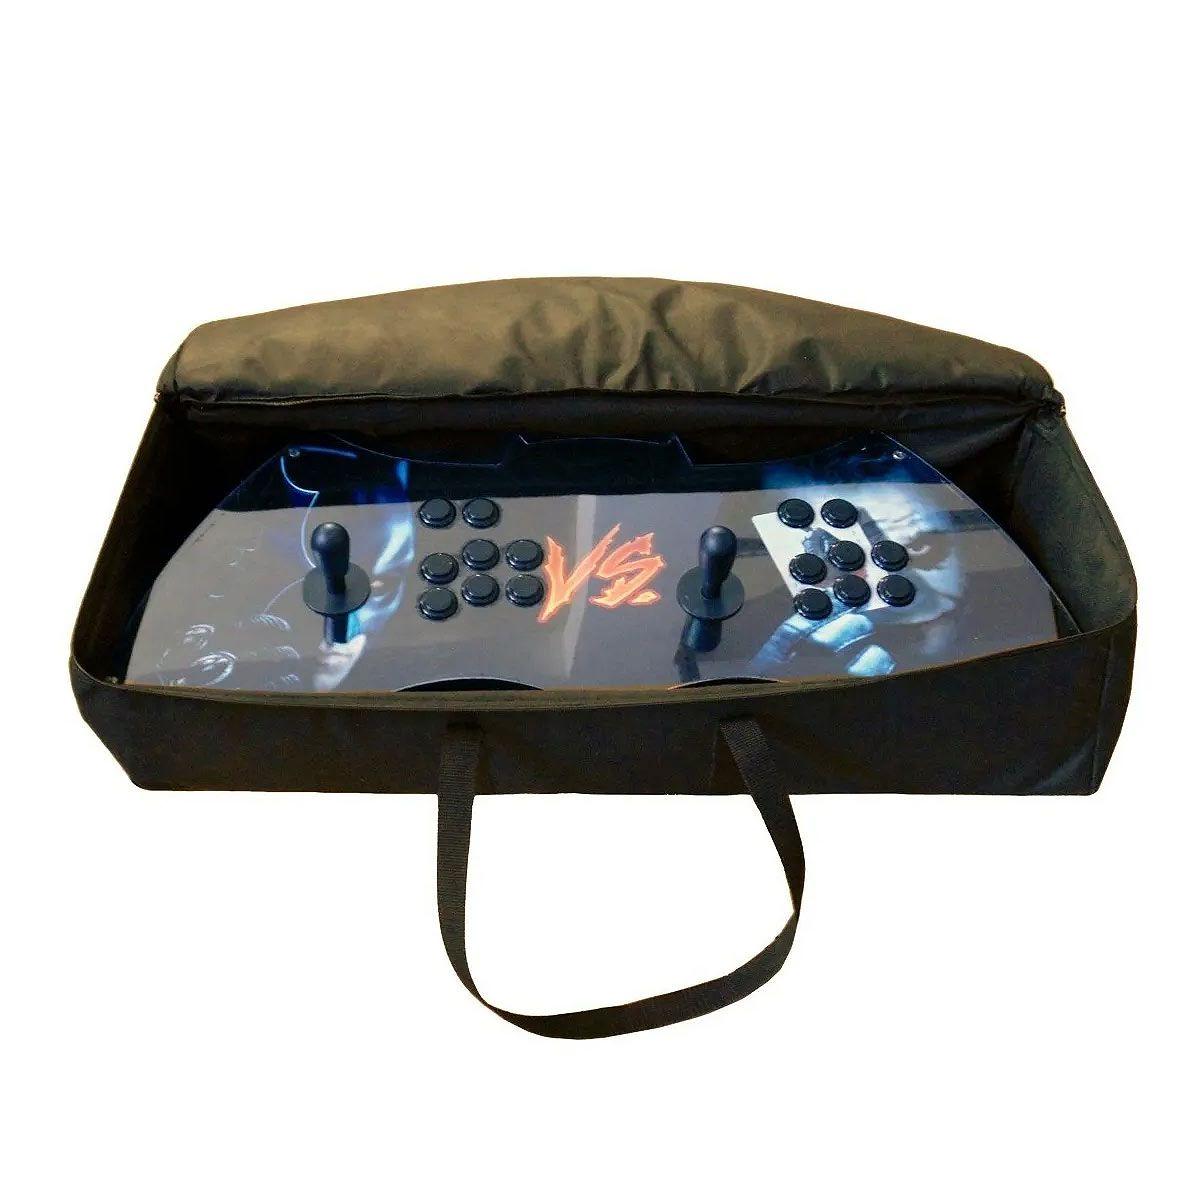 Bolsa Semi Case Multijogos Duplo Arcade Em Nylon 600 Tam P